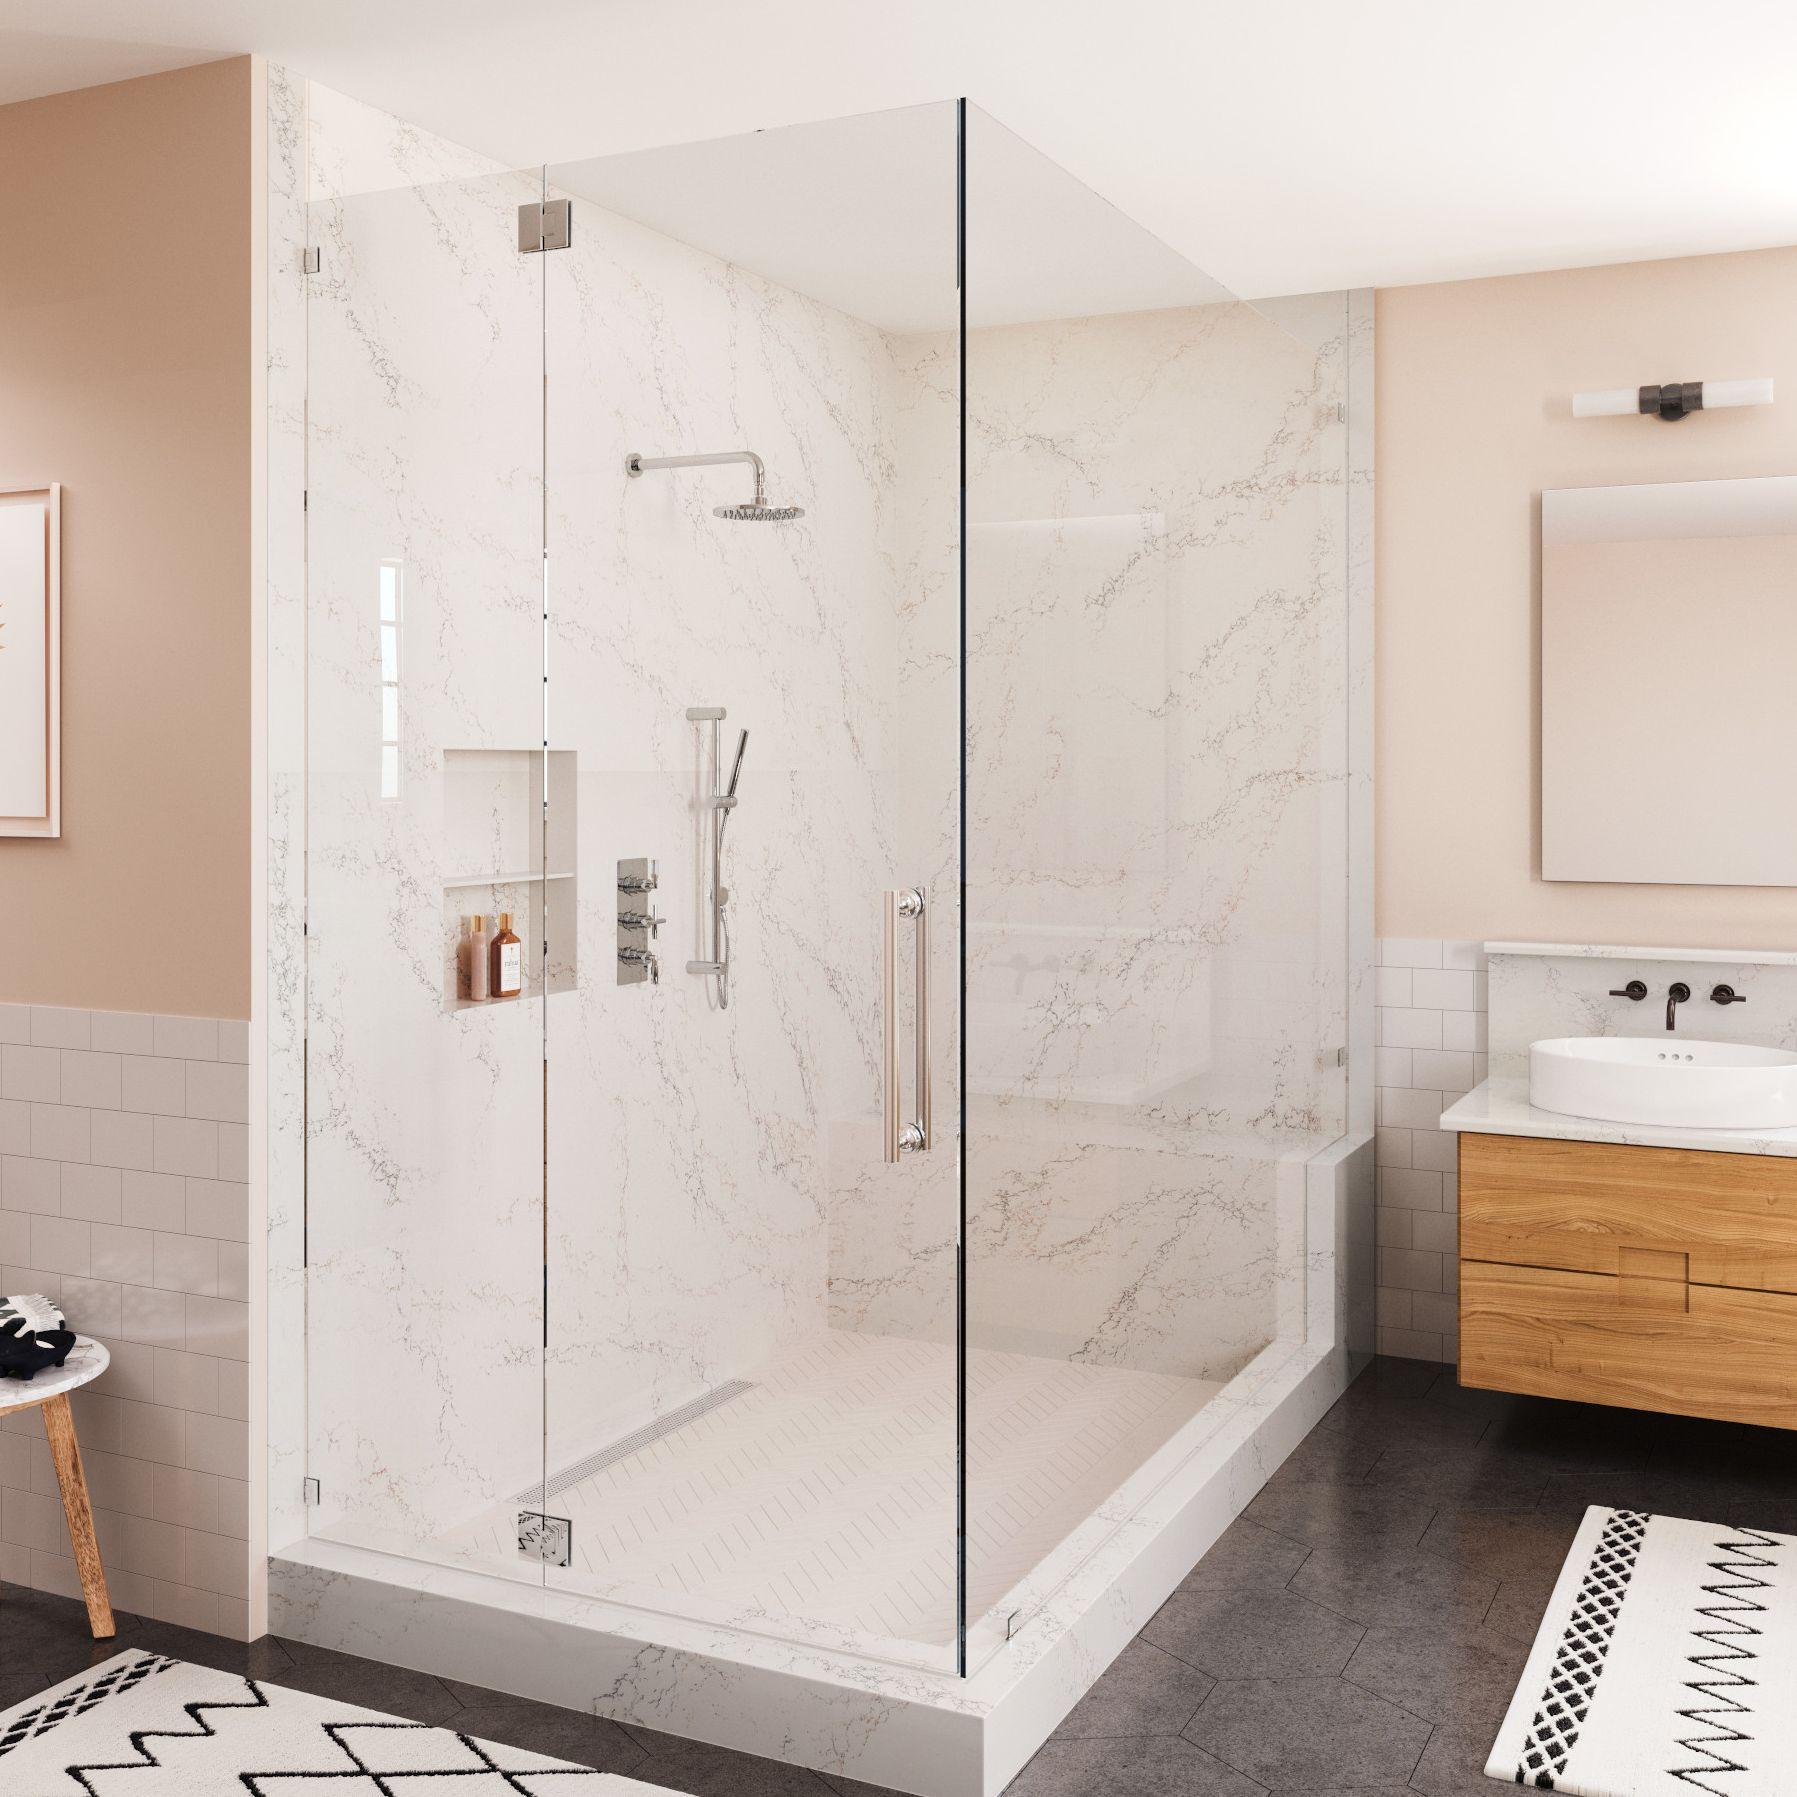 Cambria-Colton-Quartz-Countertop-bathroom